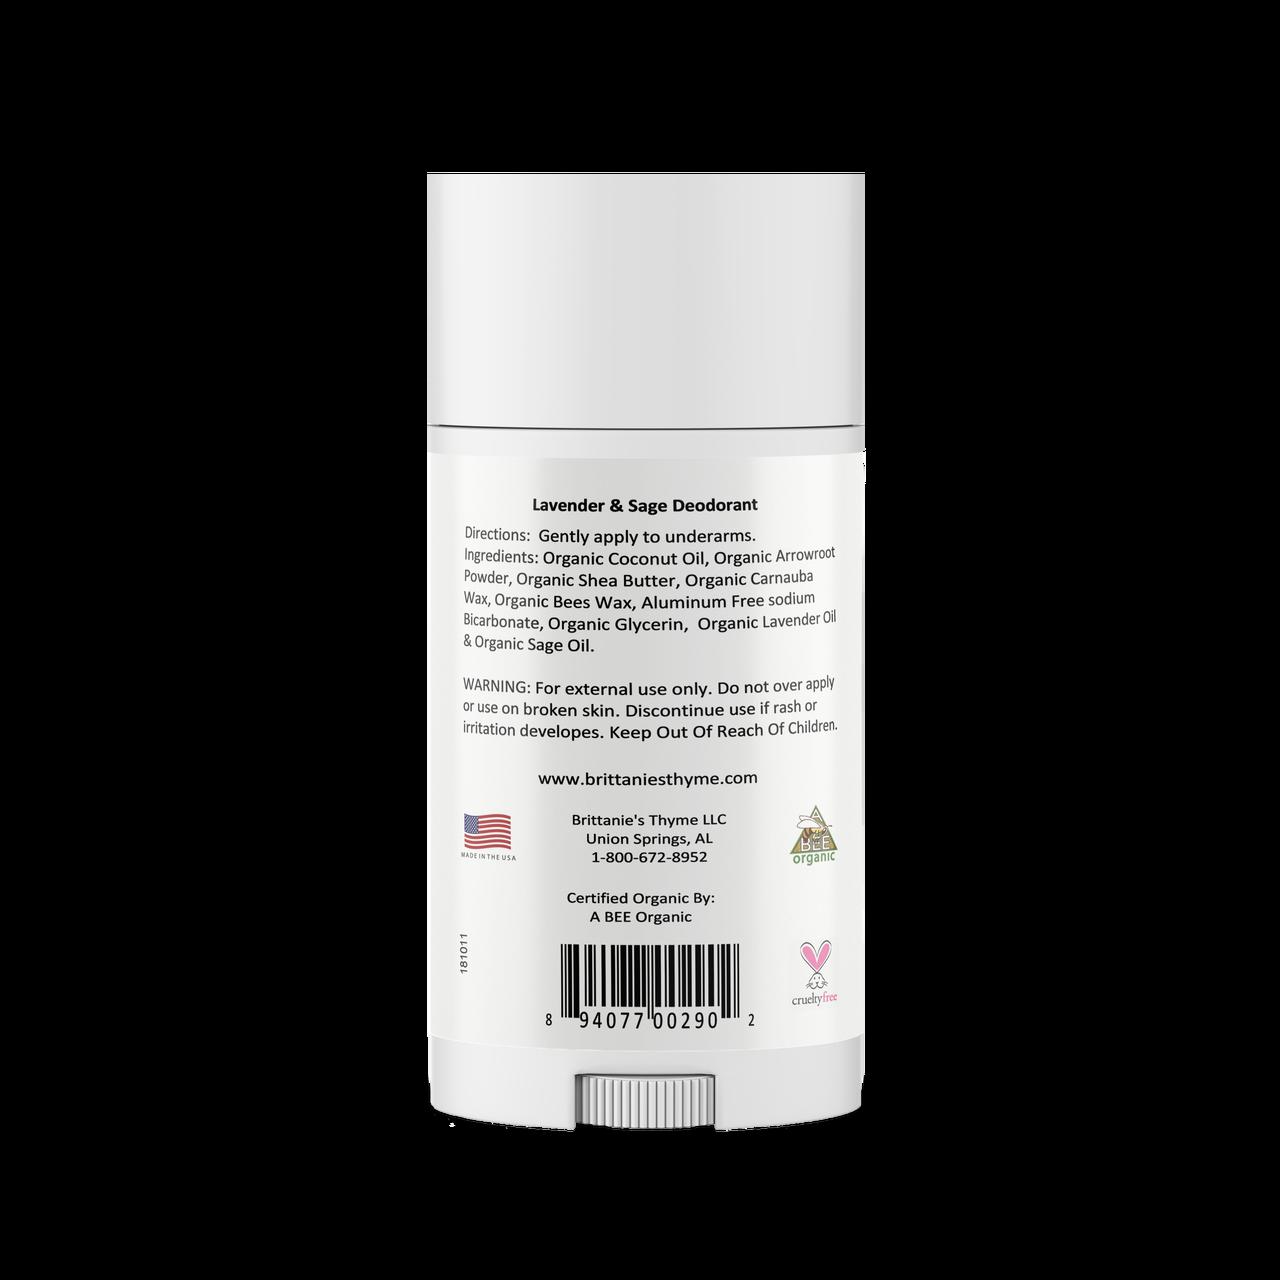 Ingredients: Organic Coconut Oil, Organic Arrowroot Powder, Organic Shea Butter, Organic Carnauba Wax, Organic Bees Wax, Aluminum Free sodium Bicarbonate, Organic Glycerin,  Organic Lavender Oil & Organic Sage Oil.